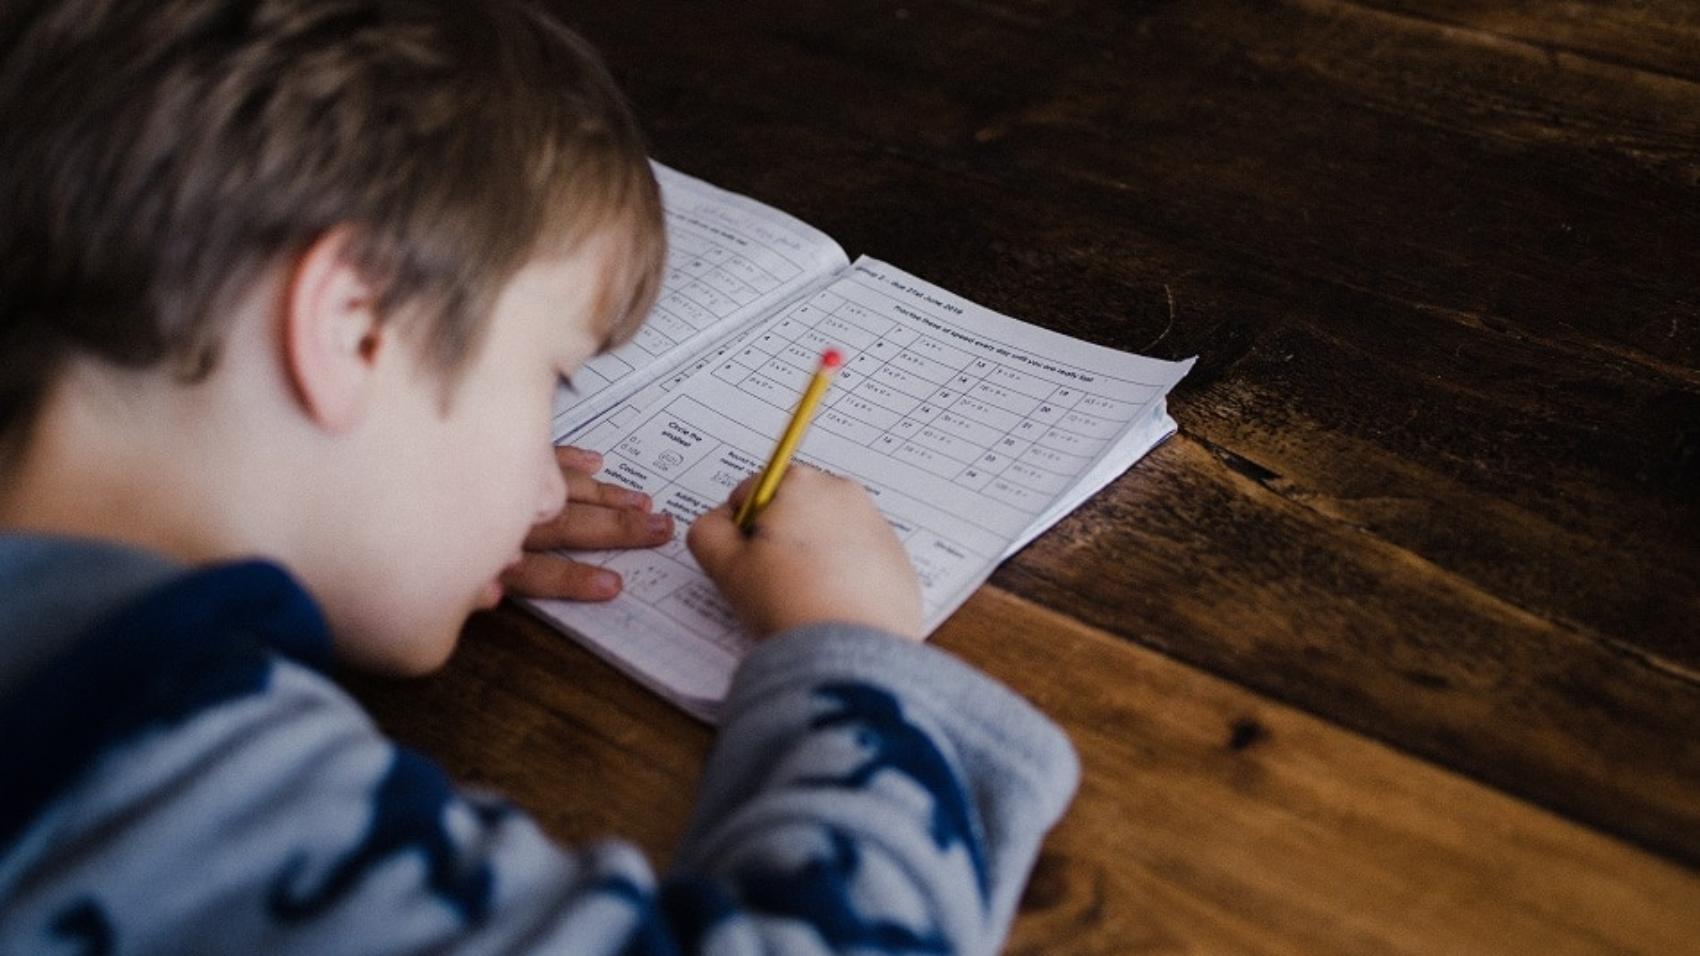 Raising Self Regulated, Focused Kids Who Listen